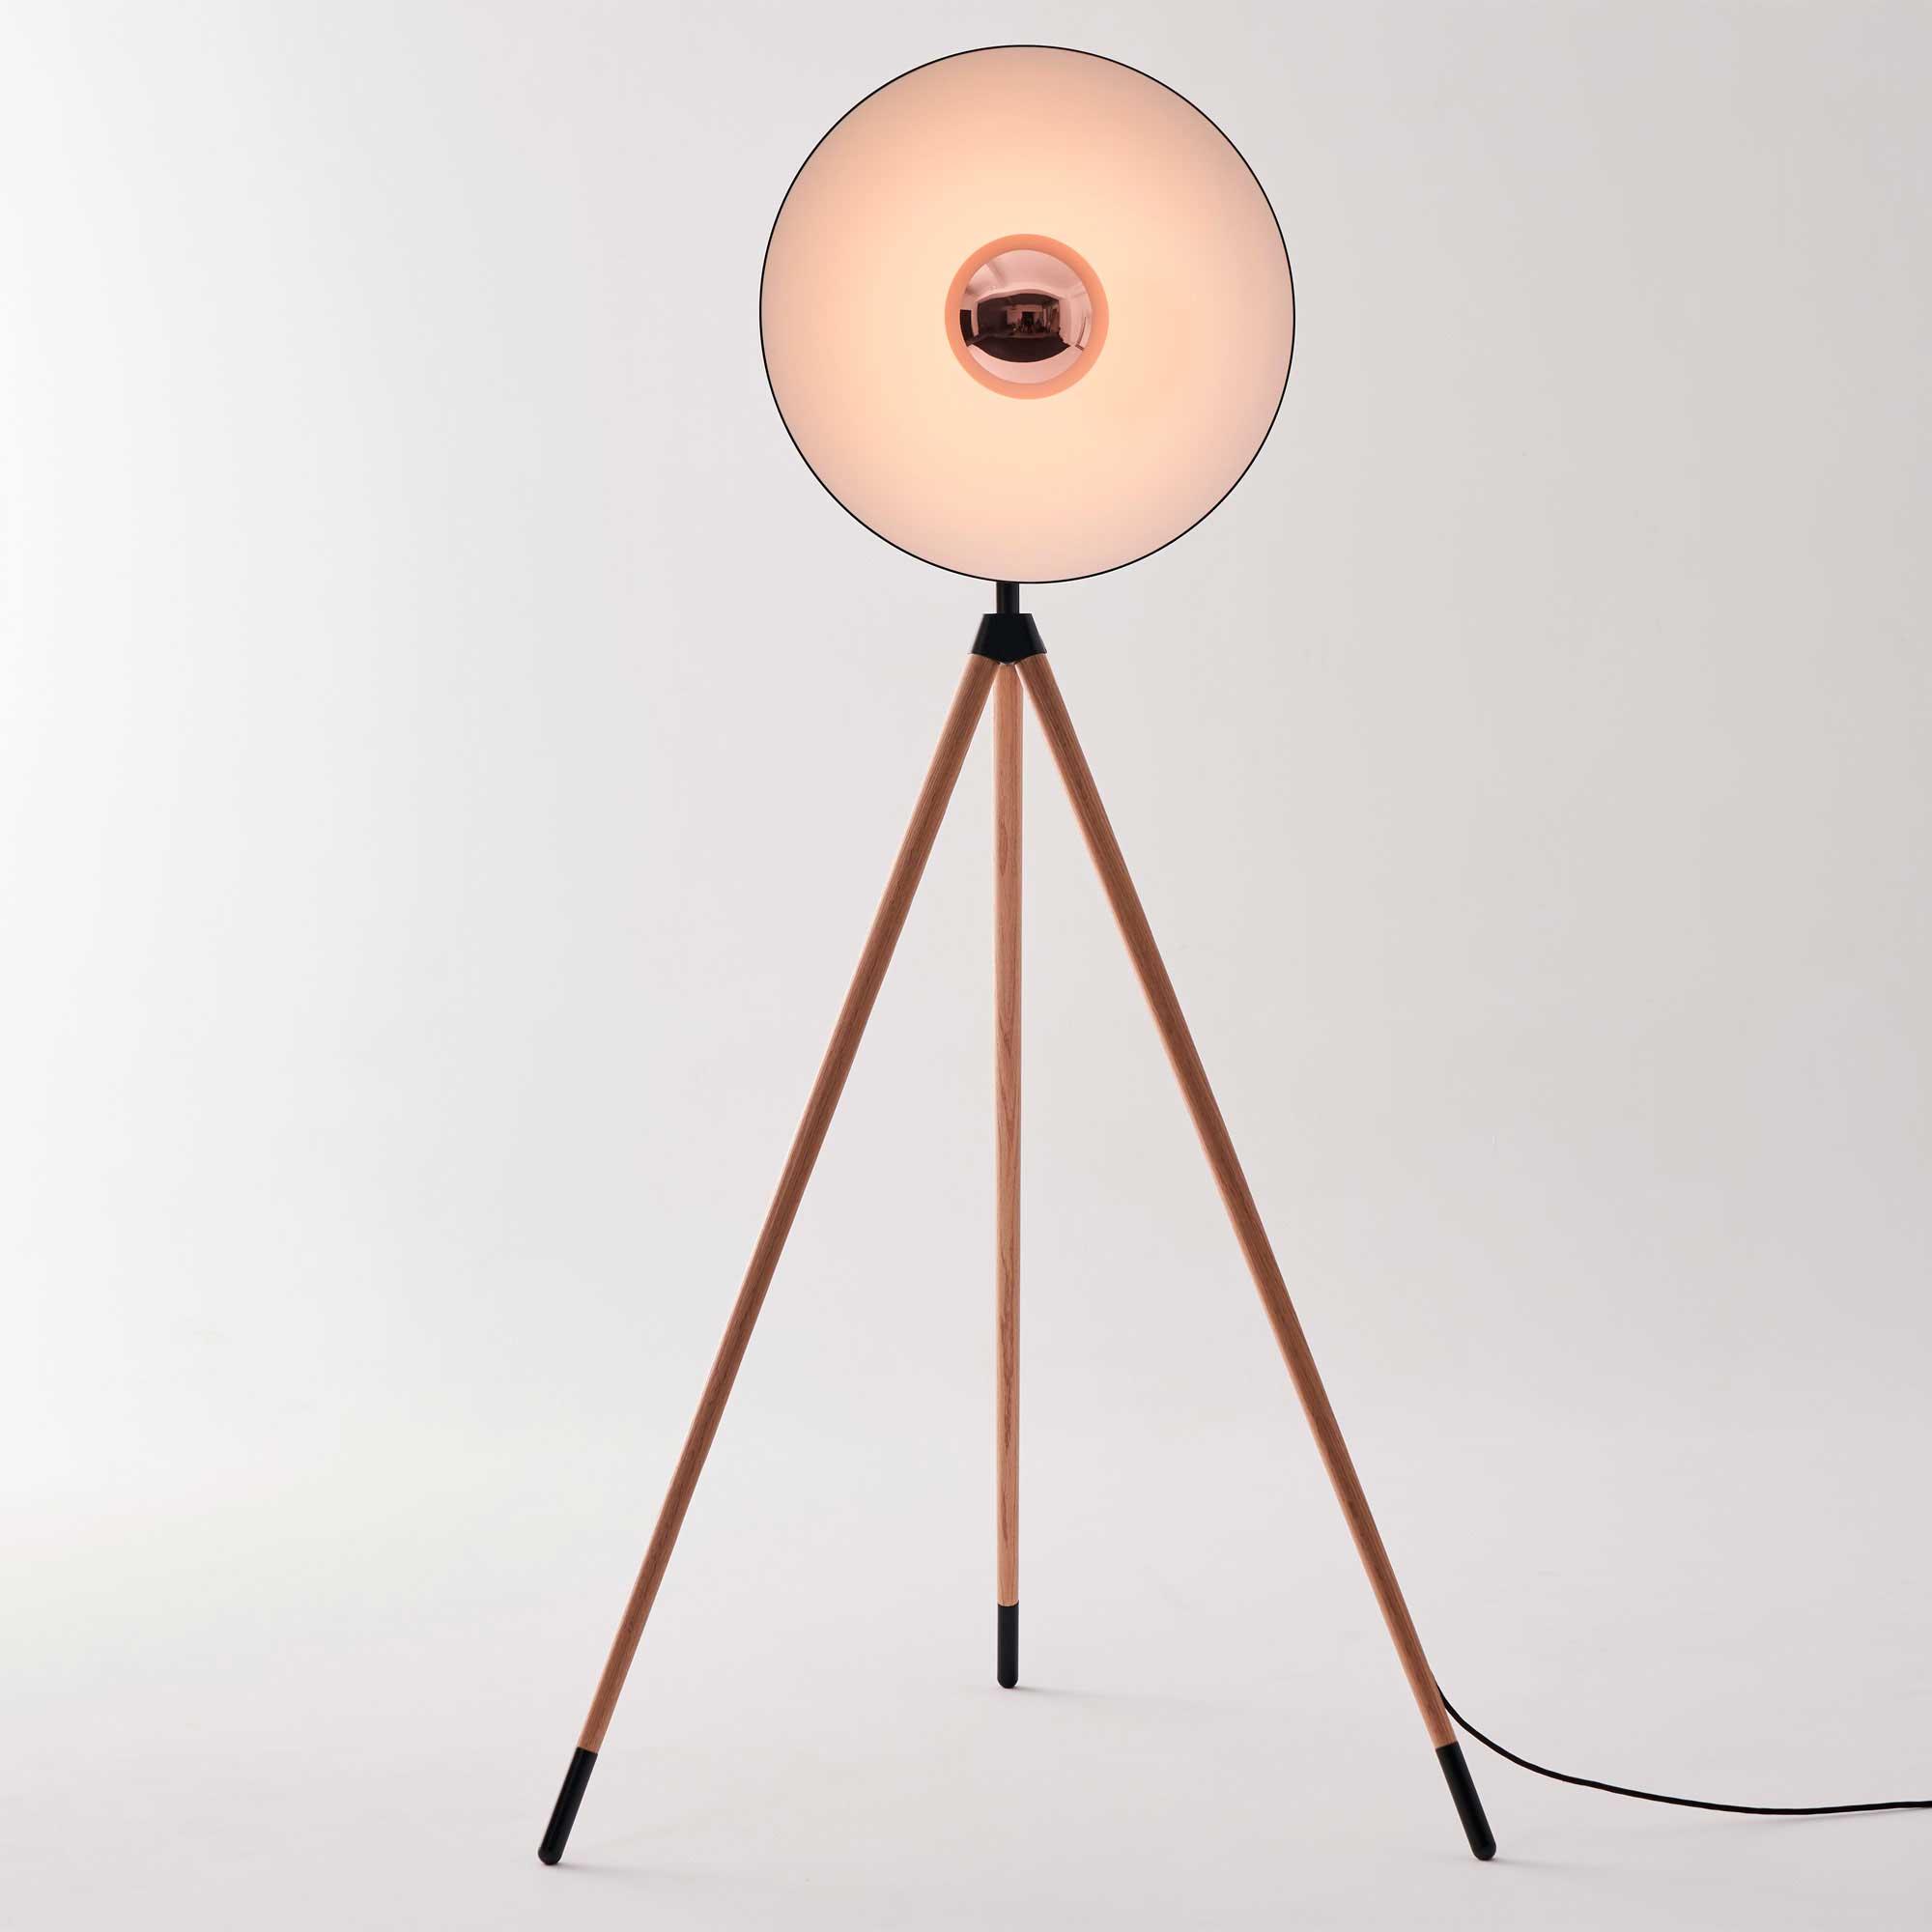 Apollo-seed-design-2